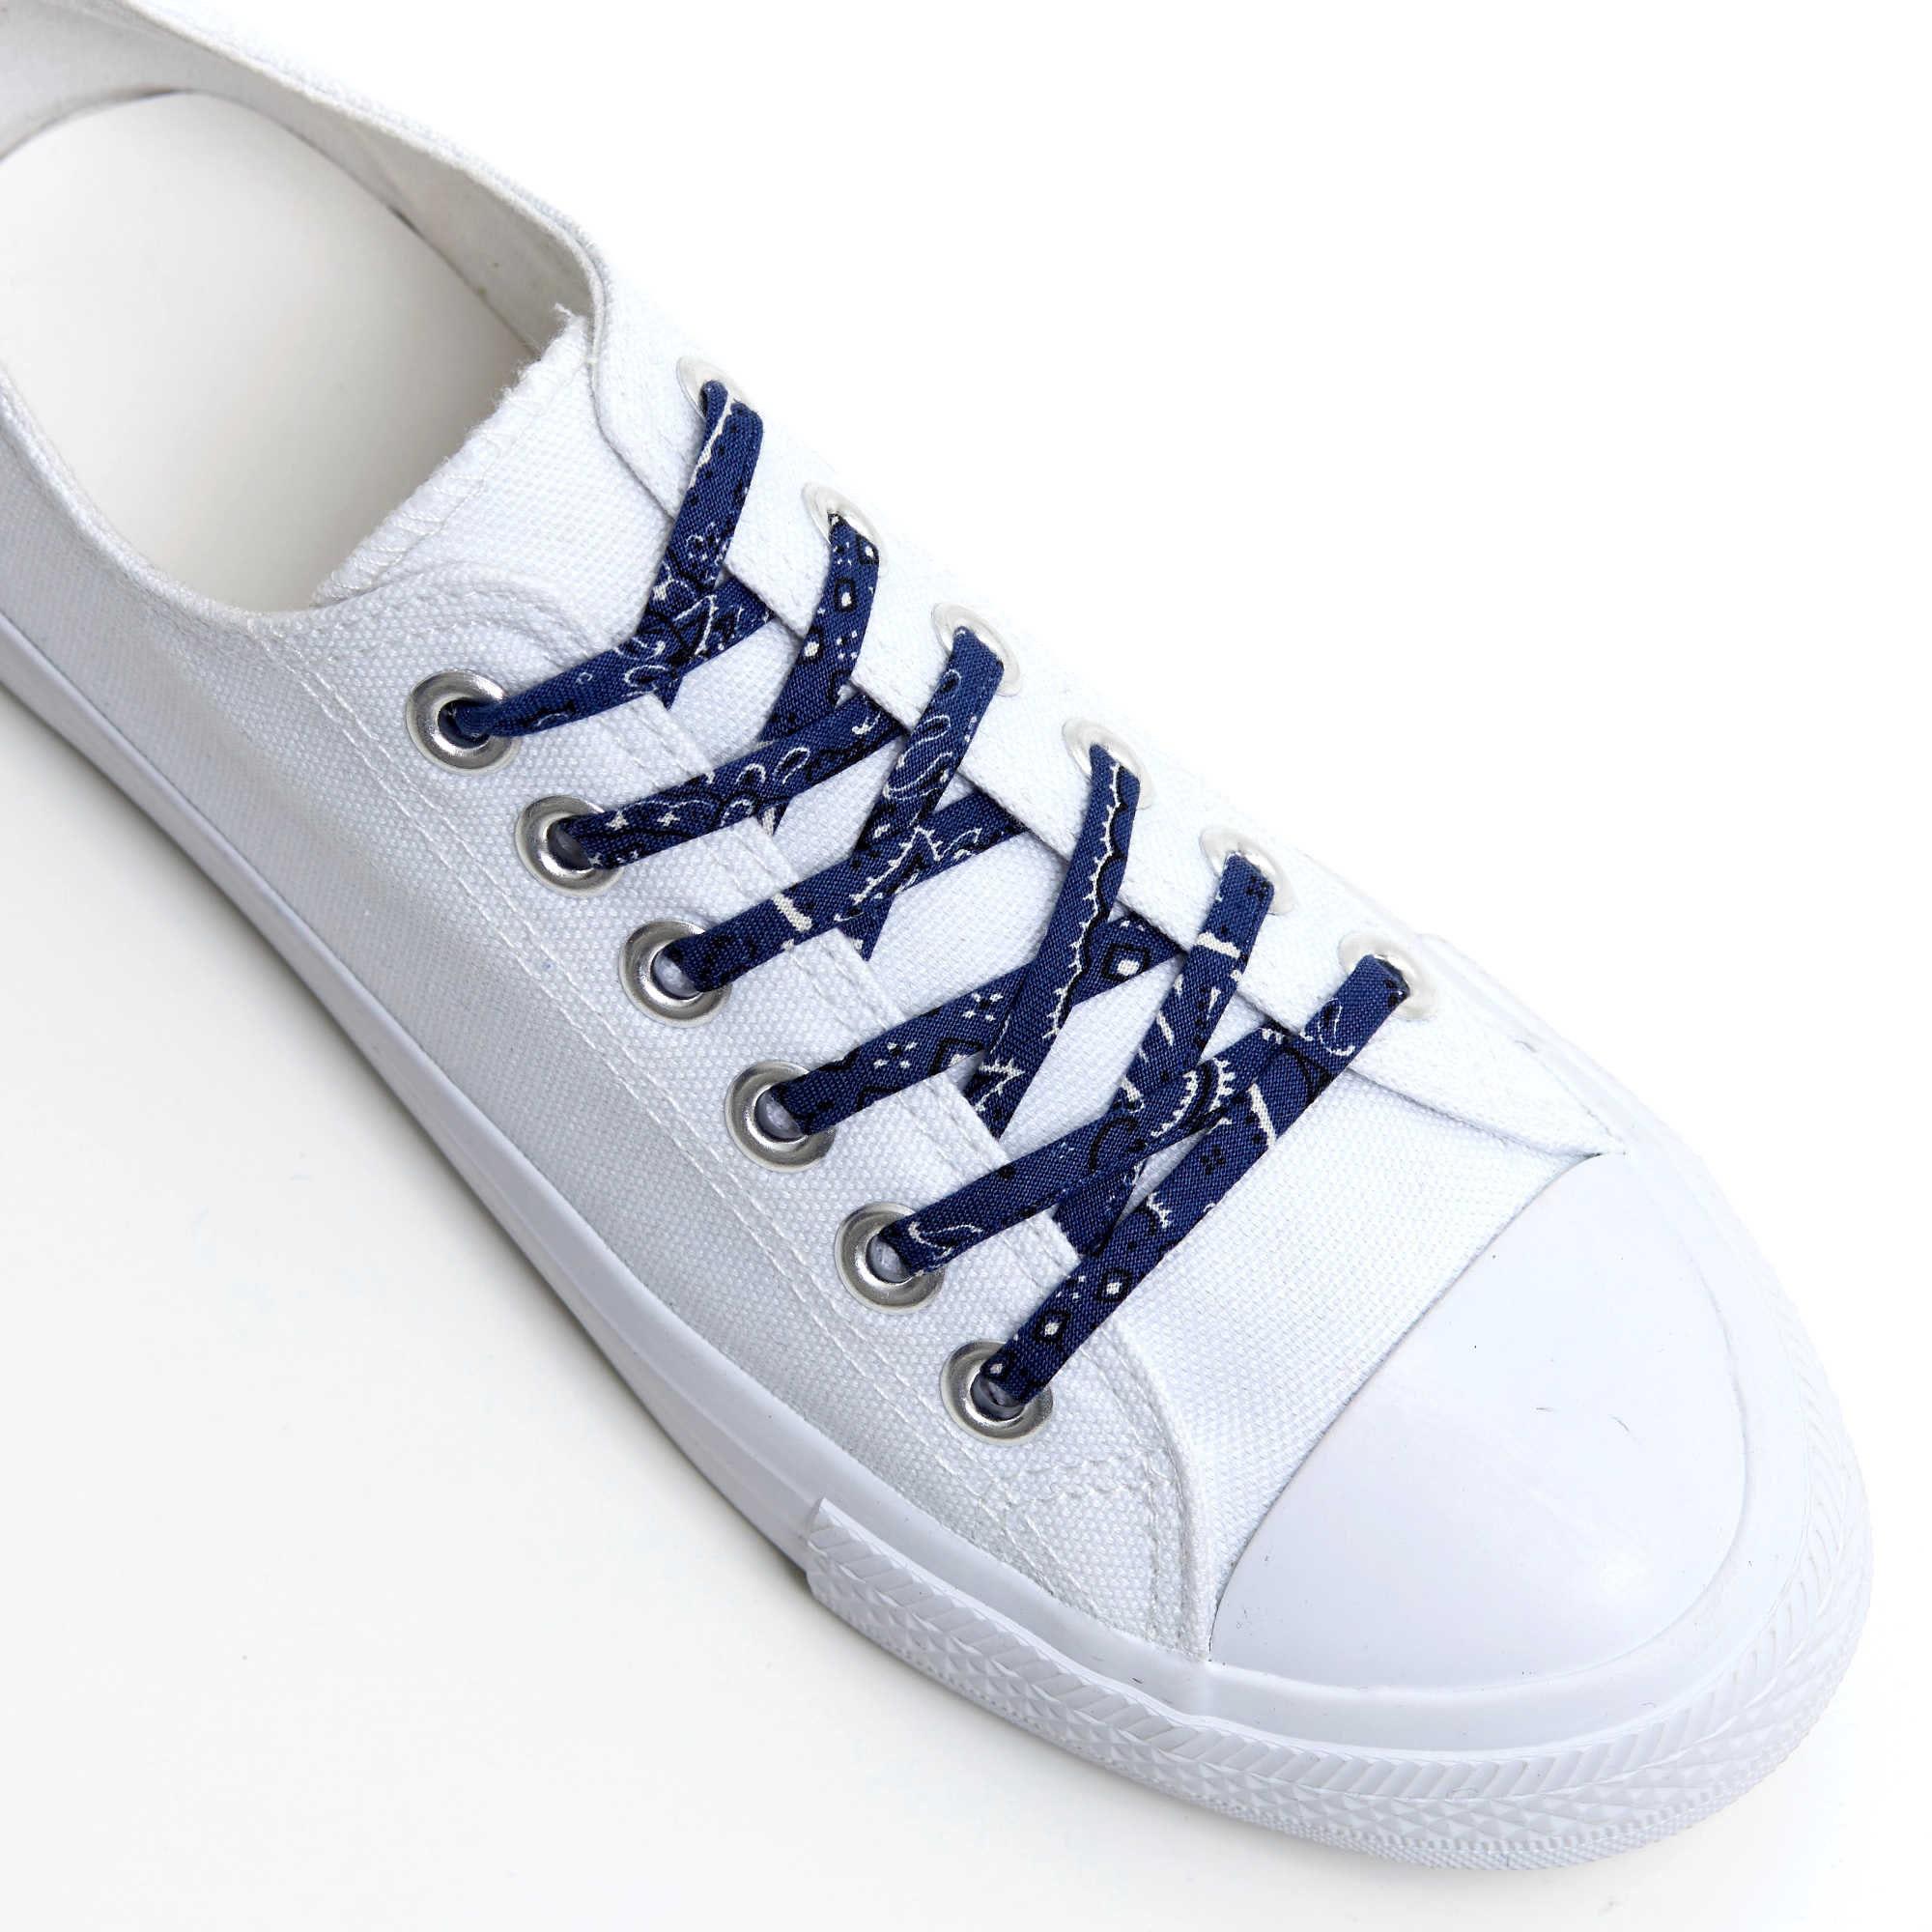 092cfe25965dc Shoelaces with Blue Bandana Print - Shoe Laces - Shoestrings